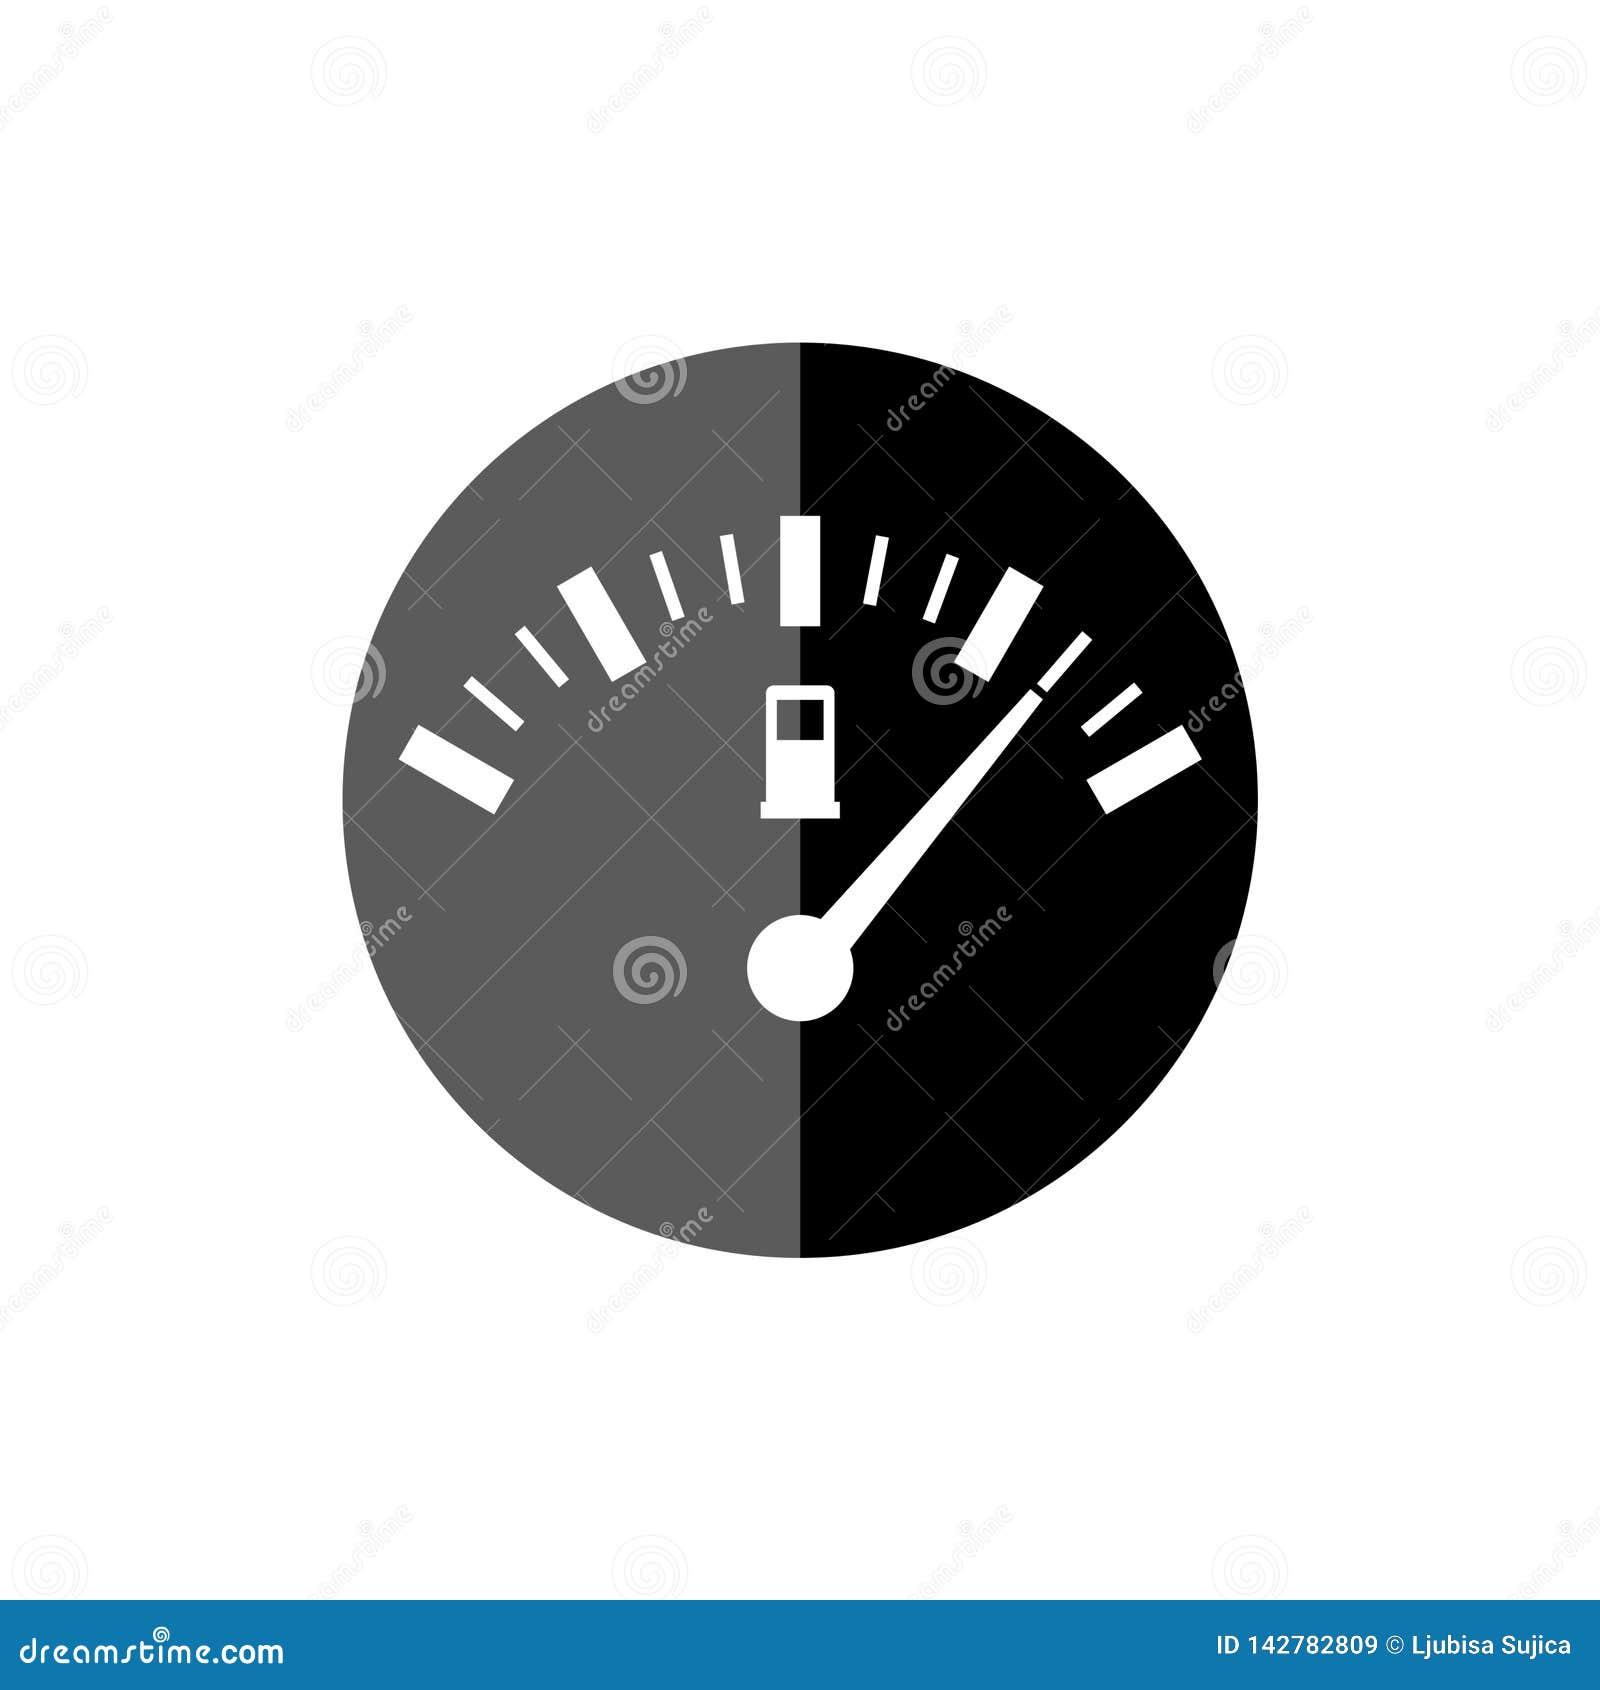 Fuel Gauge Icon, Full Gas Tank Stock Illustration - Illustration of